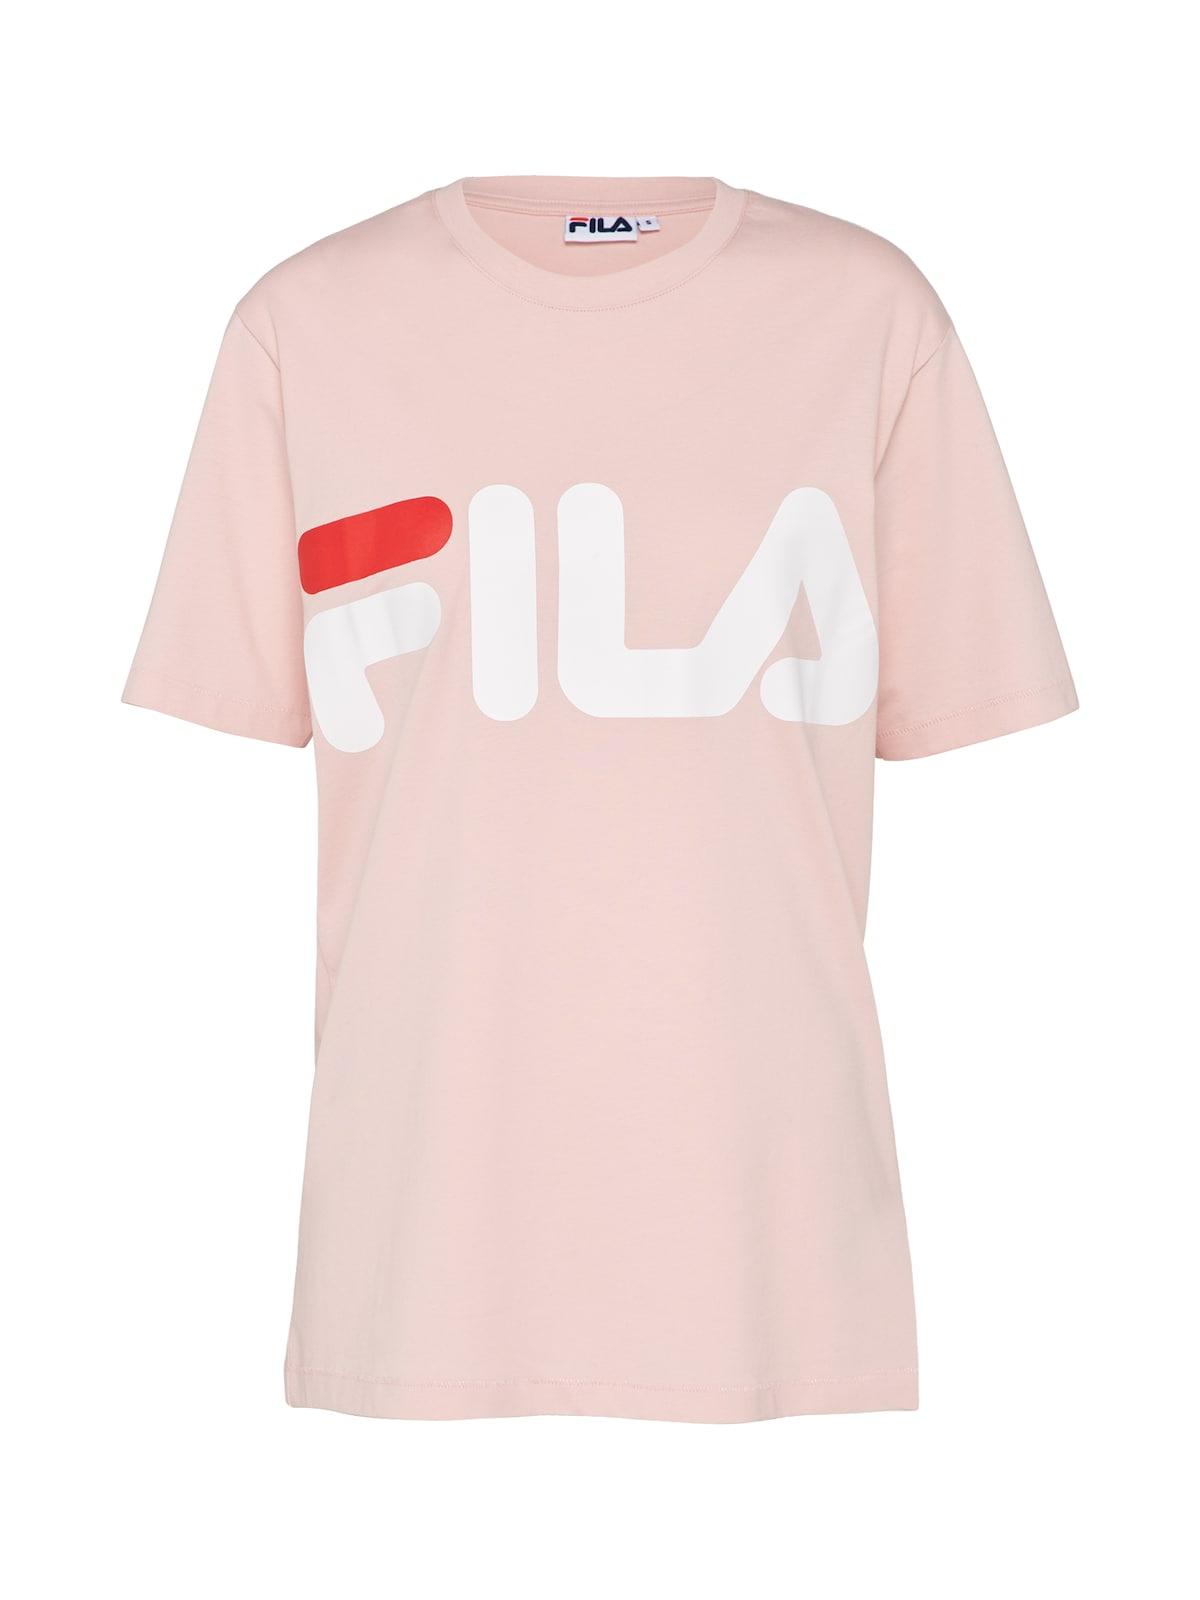 FILA ´Classic Logo´ T-Shirt